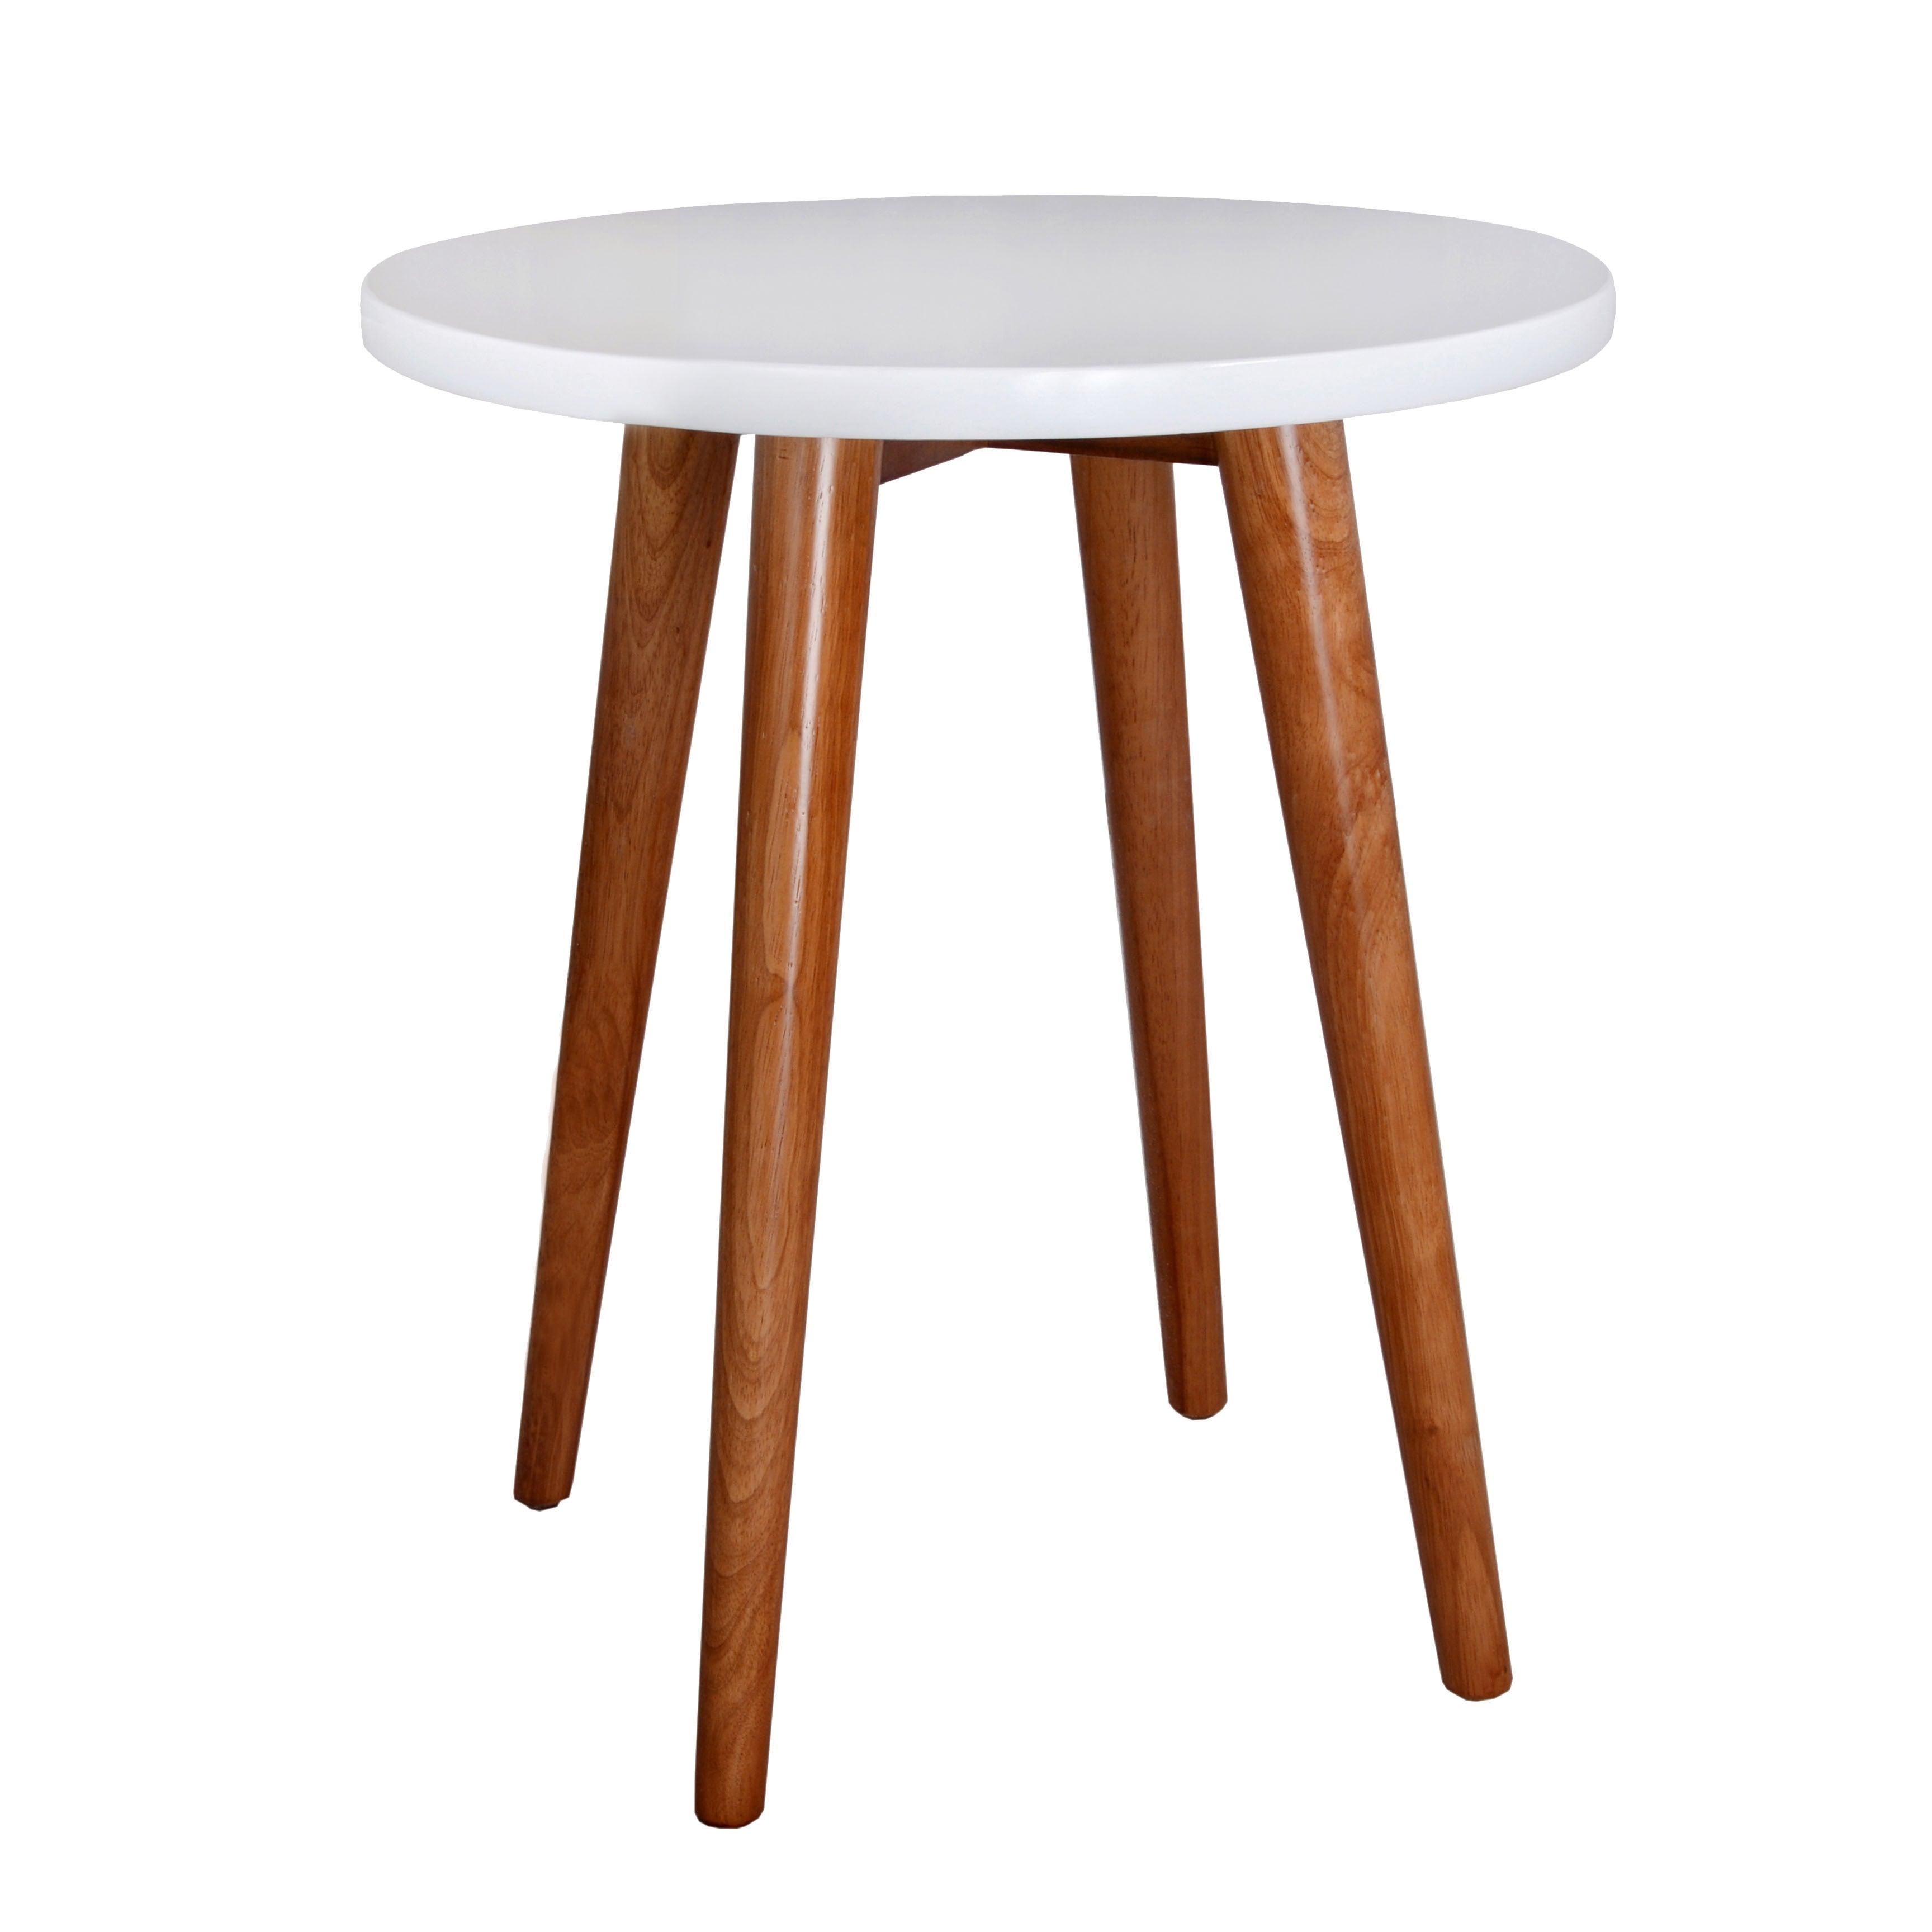 Porthos Home Ashton Side Table